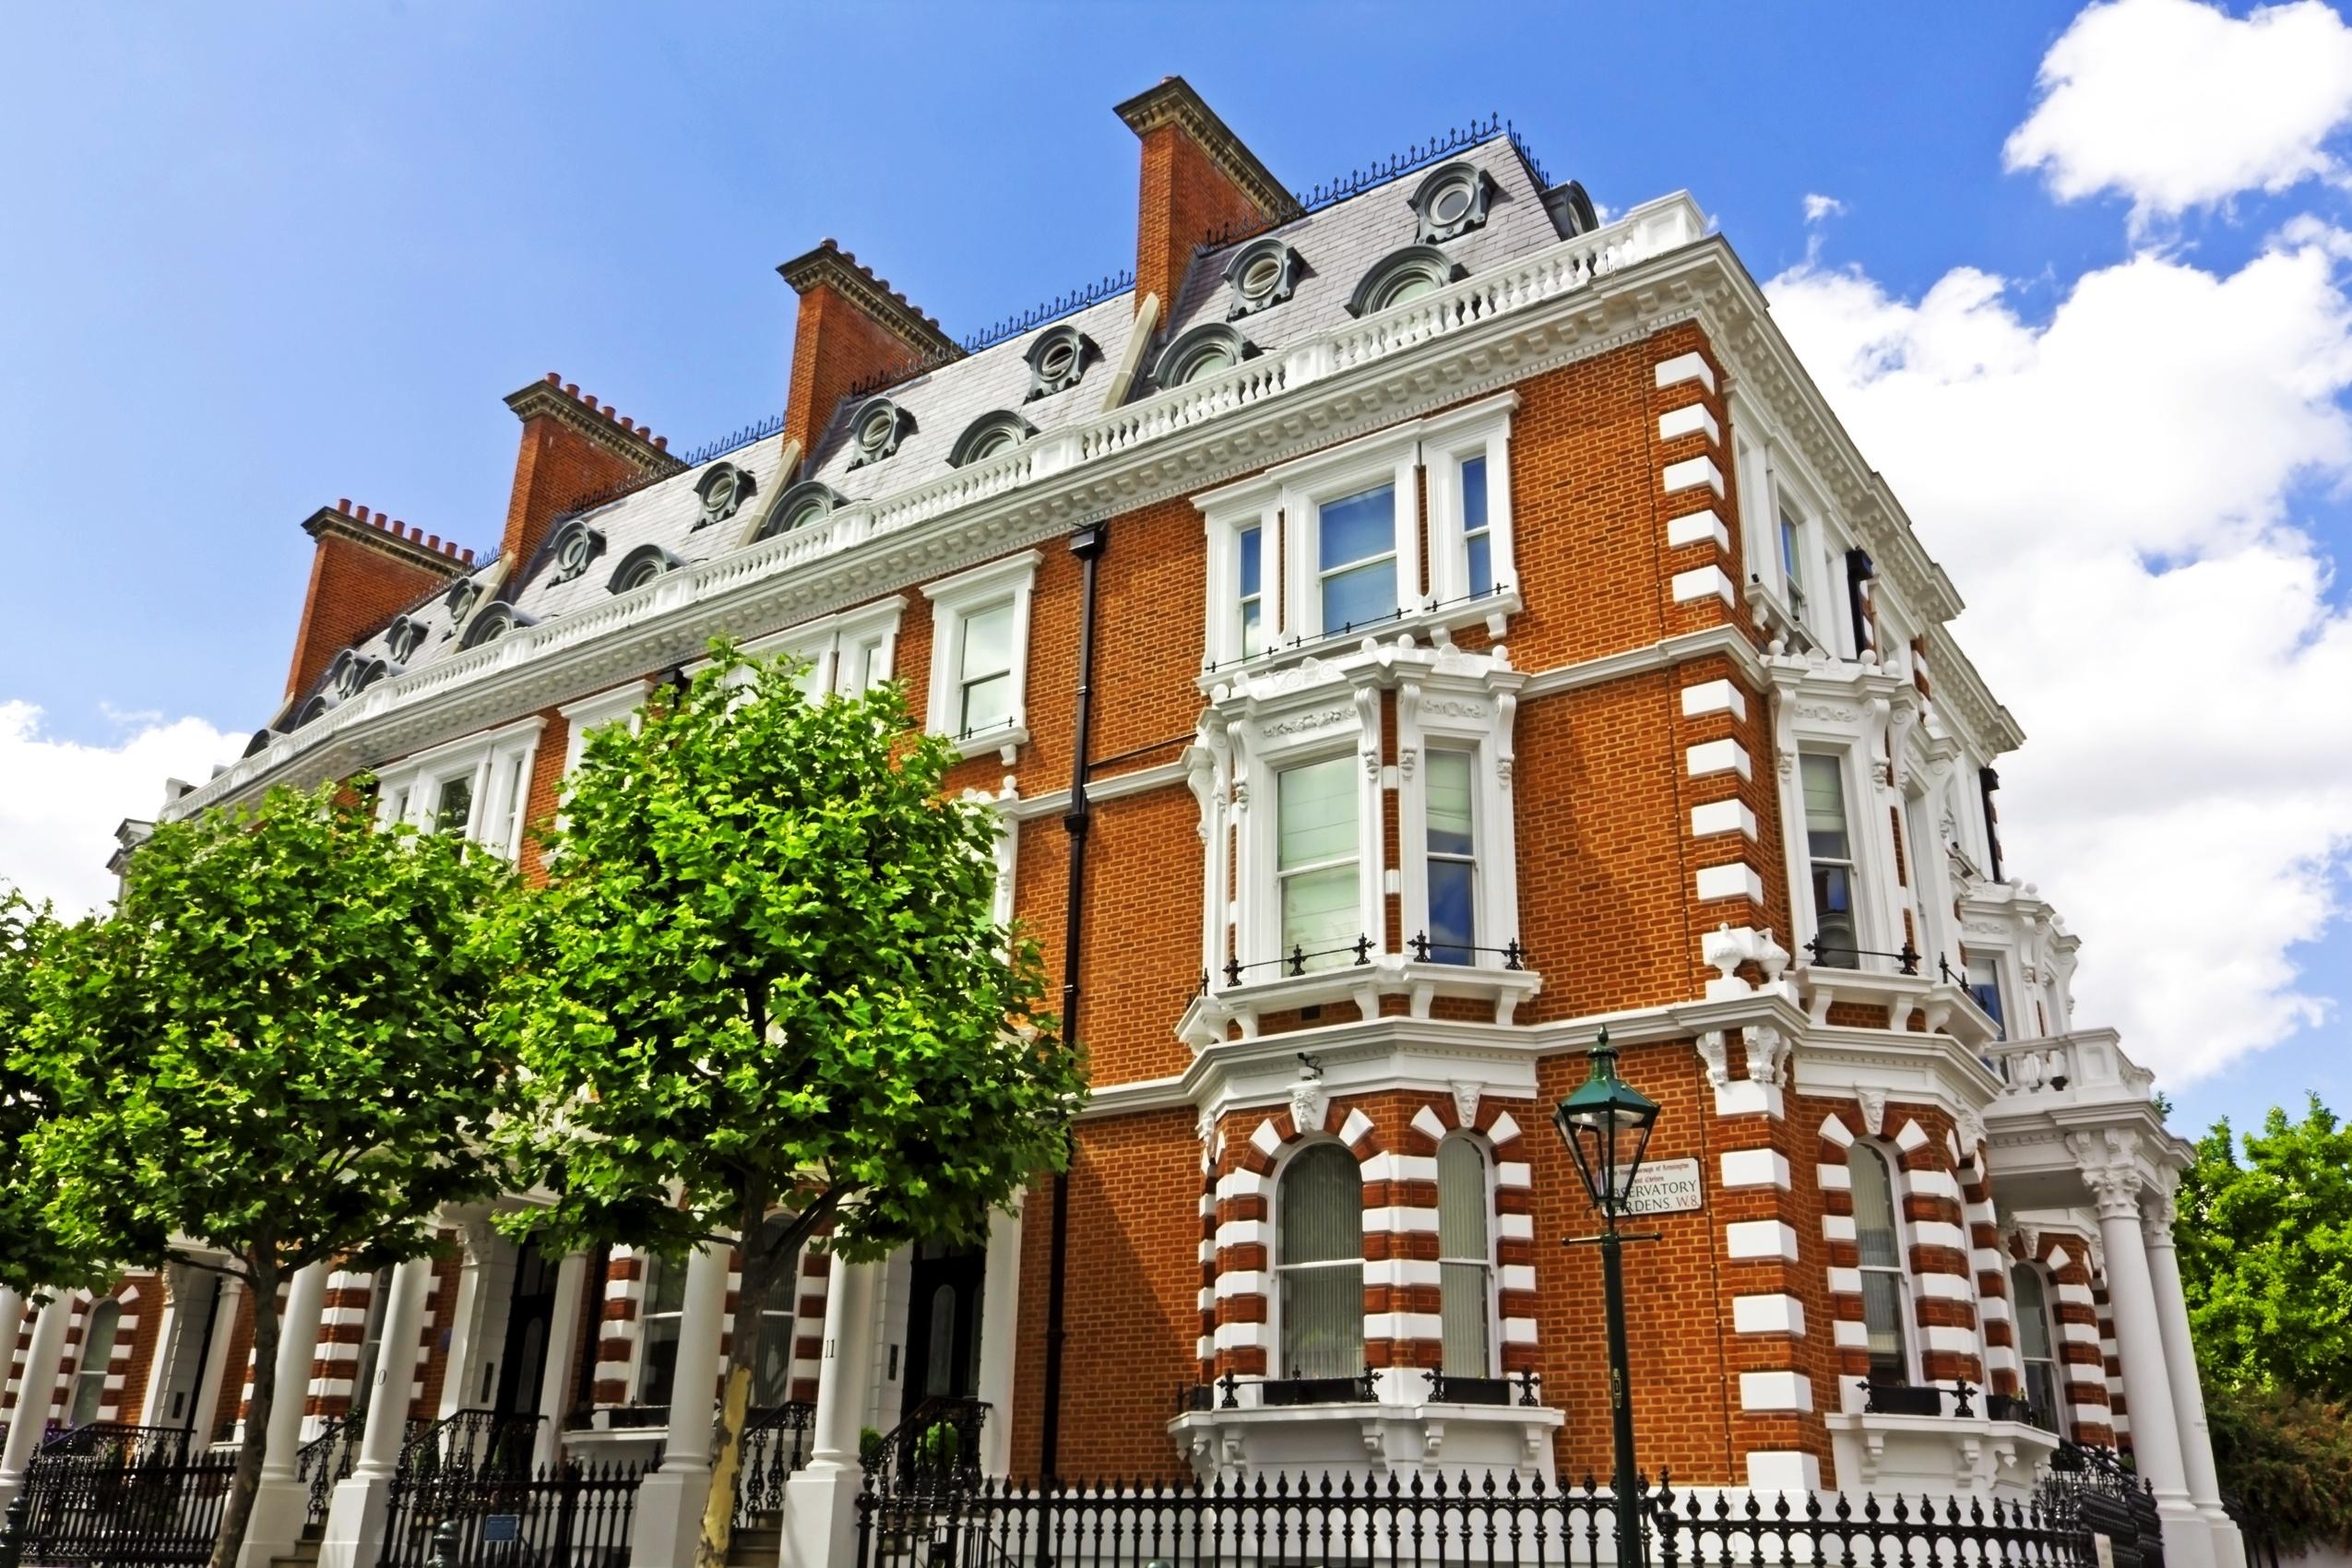 Luxury Apartment Building In London